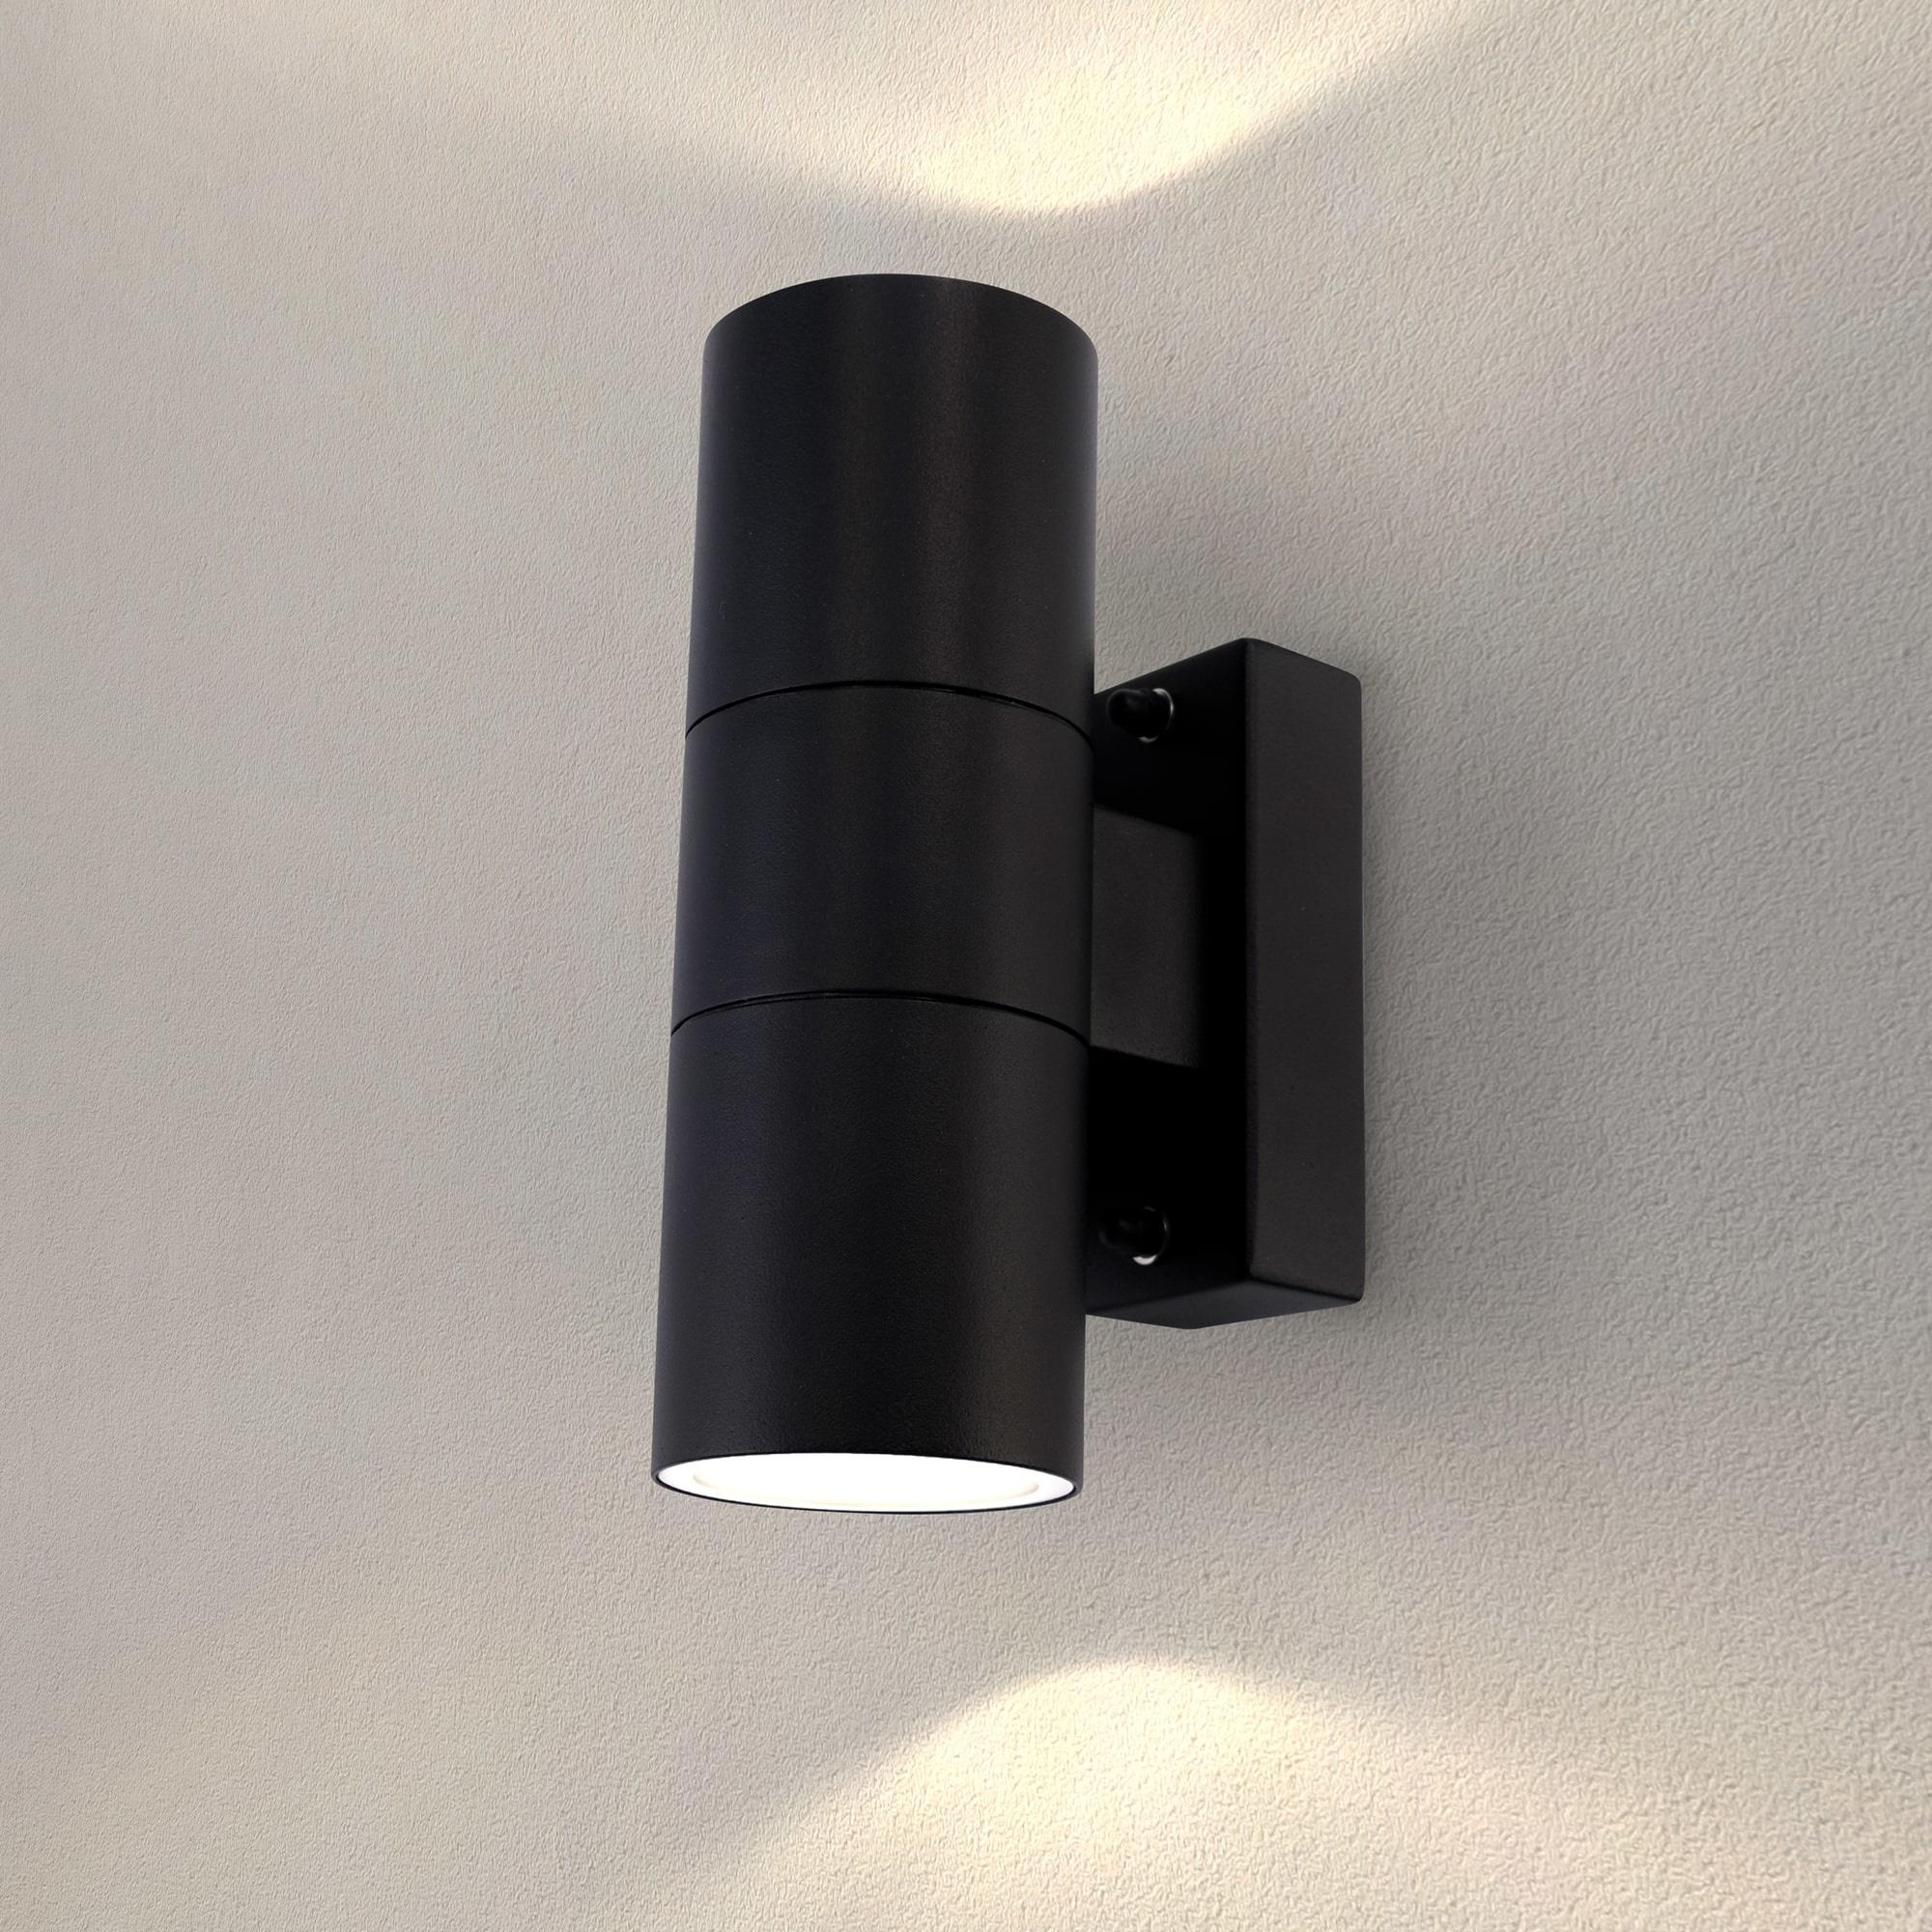 LED Wandlamp Up & Down  Telesto - Zwart - GU10